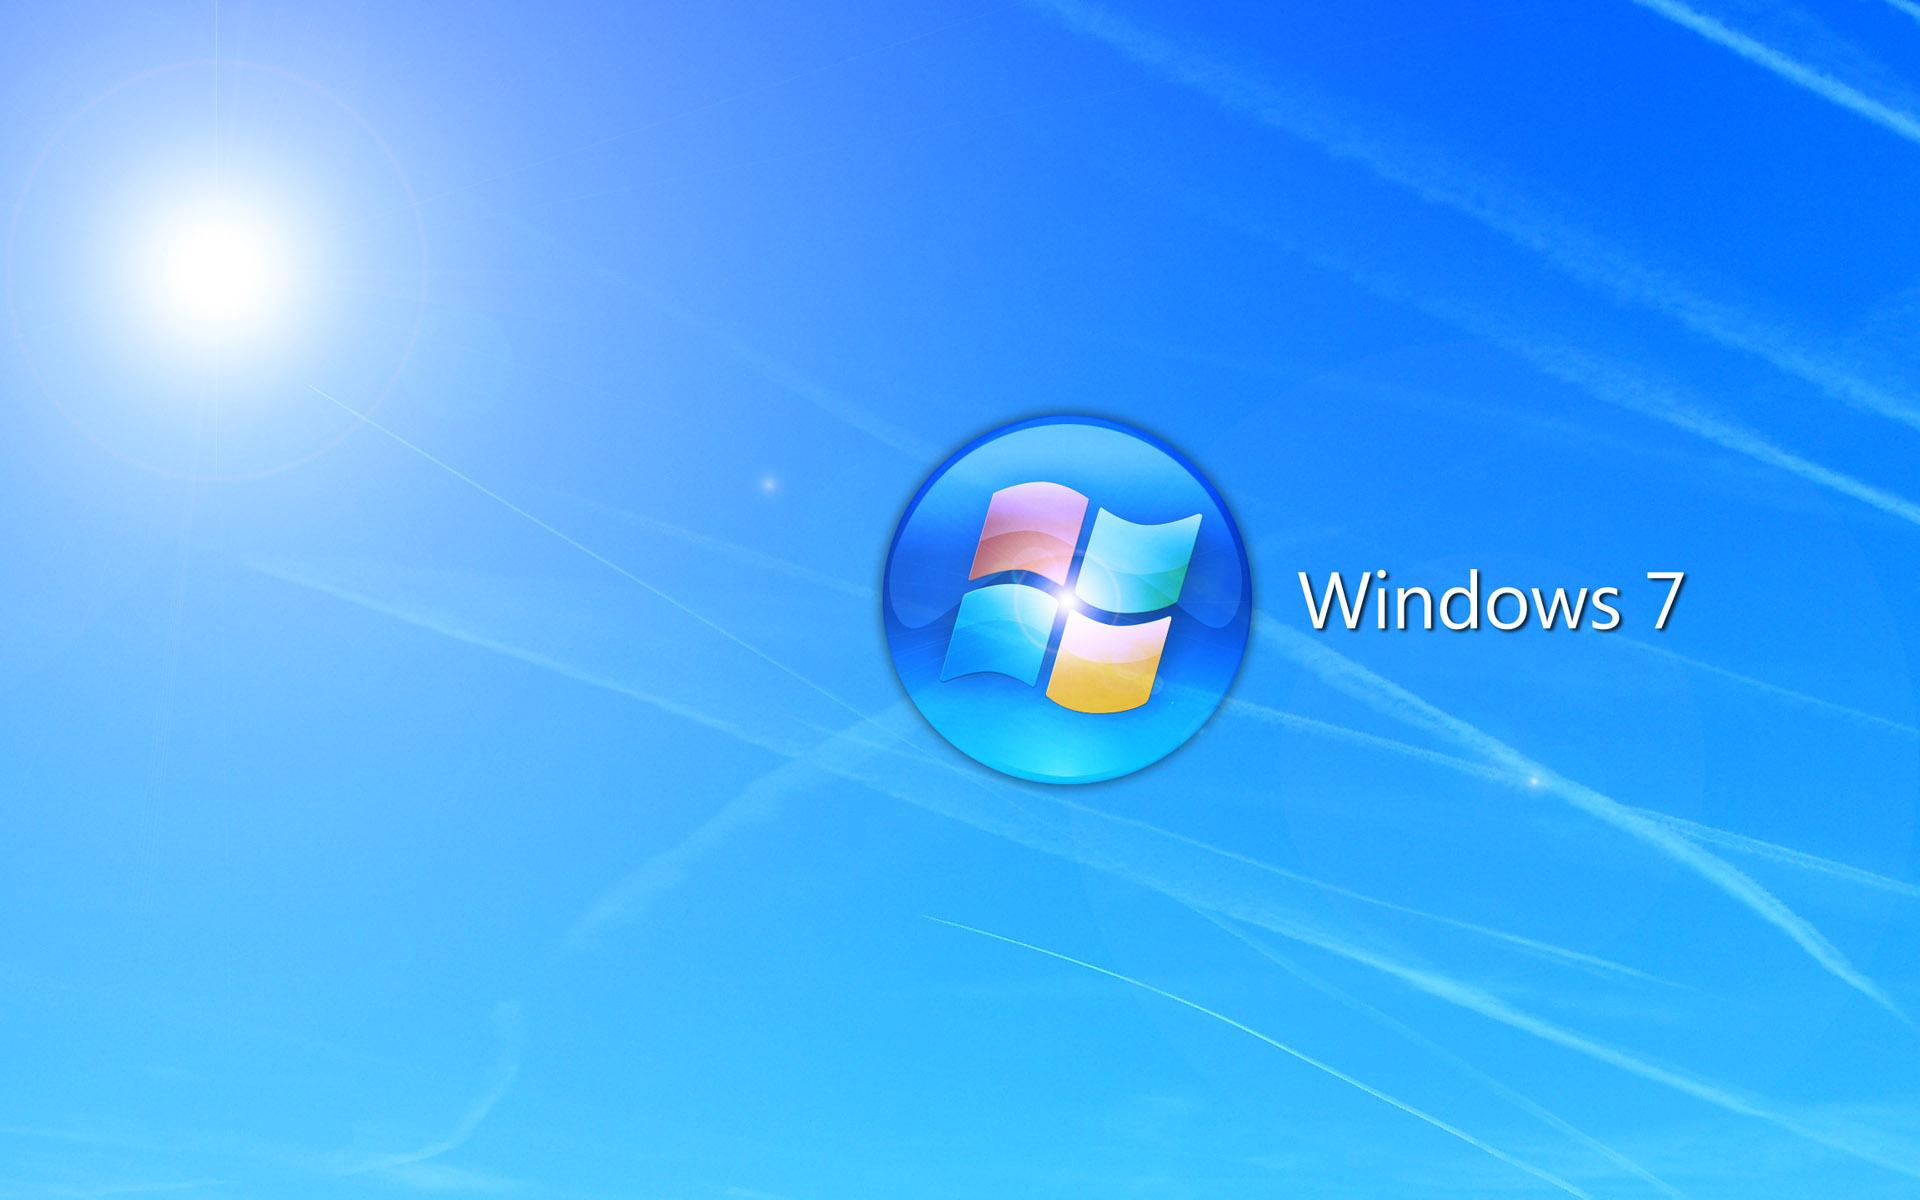 Windows 7 desktop backgrounds   SF Wallpaper 1920x1200